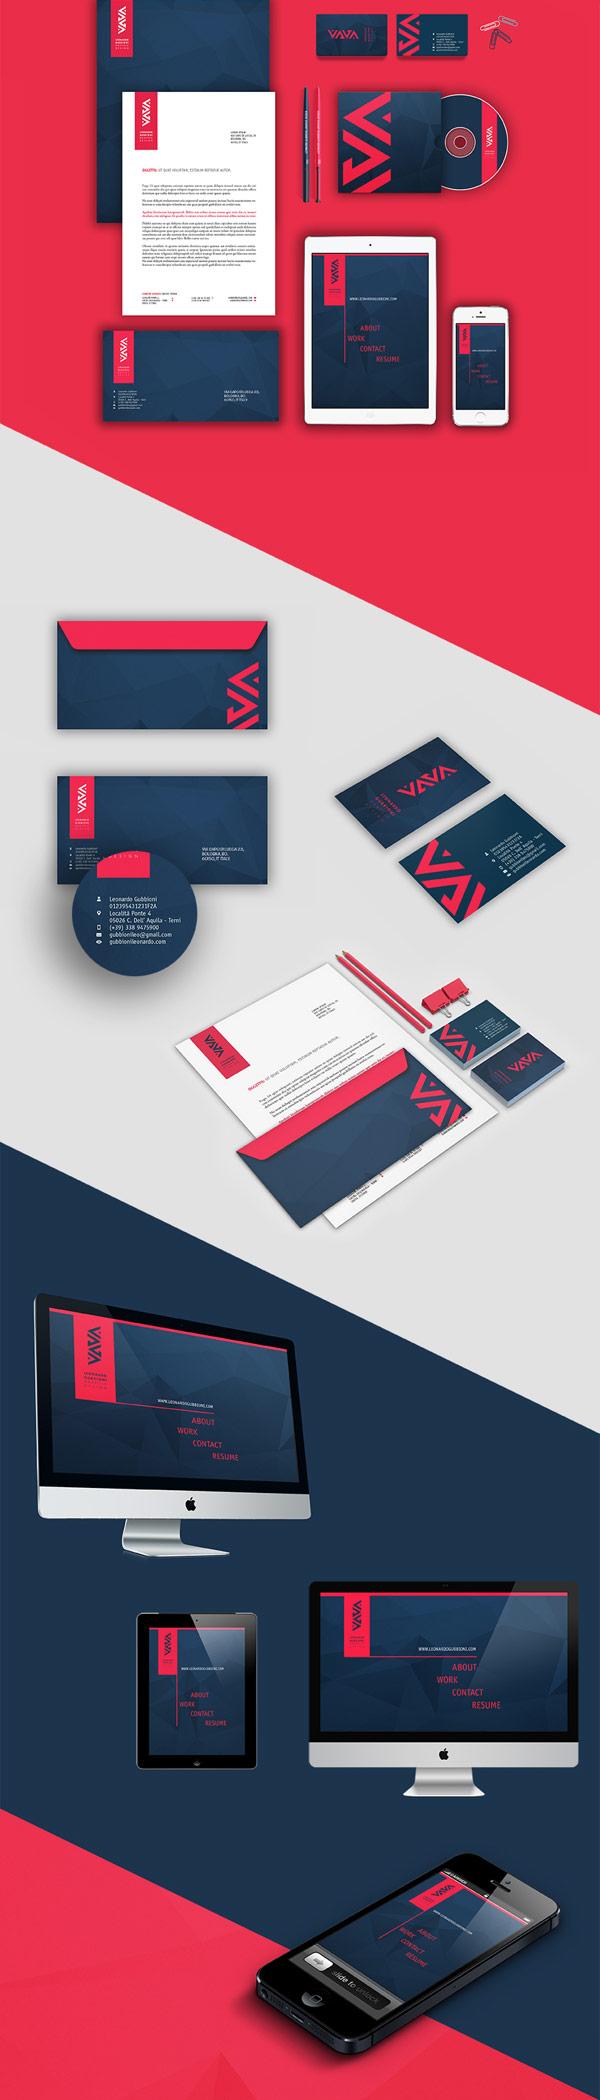 Personal Branding by Leonardo Gubbioni